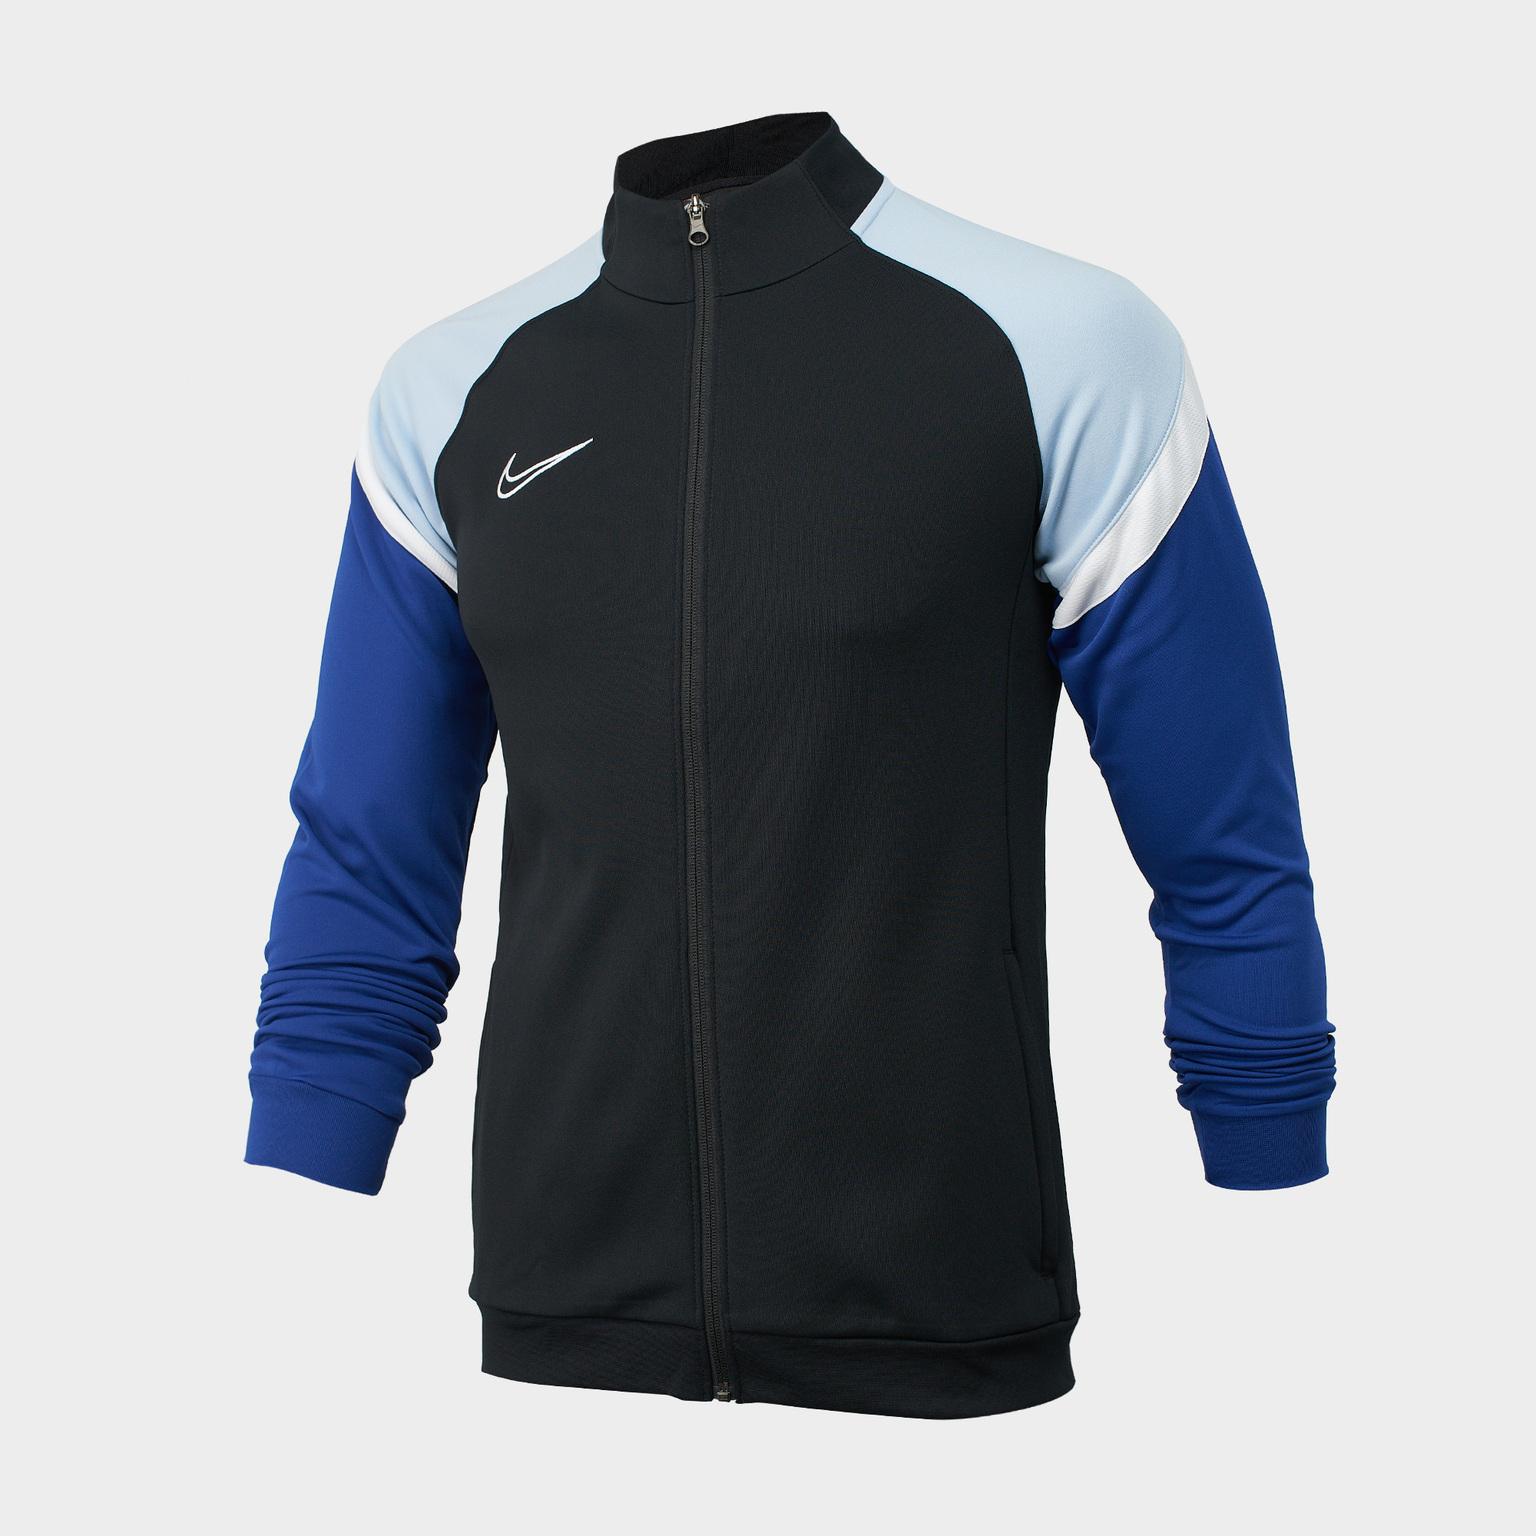 Олимпийка Nike Dry Academy CT2493-011